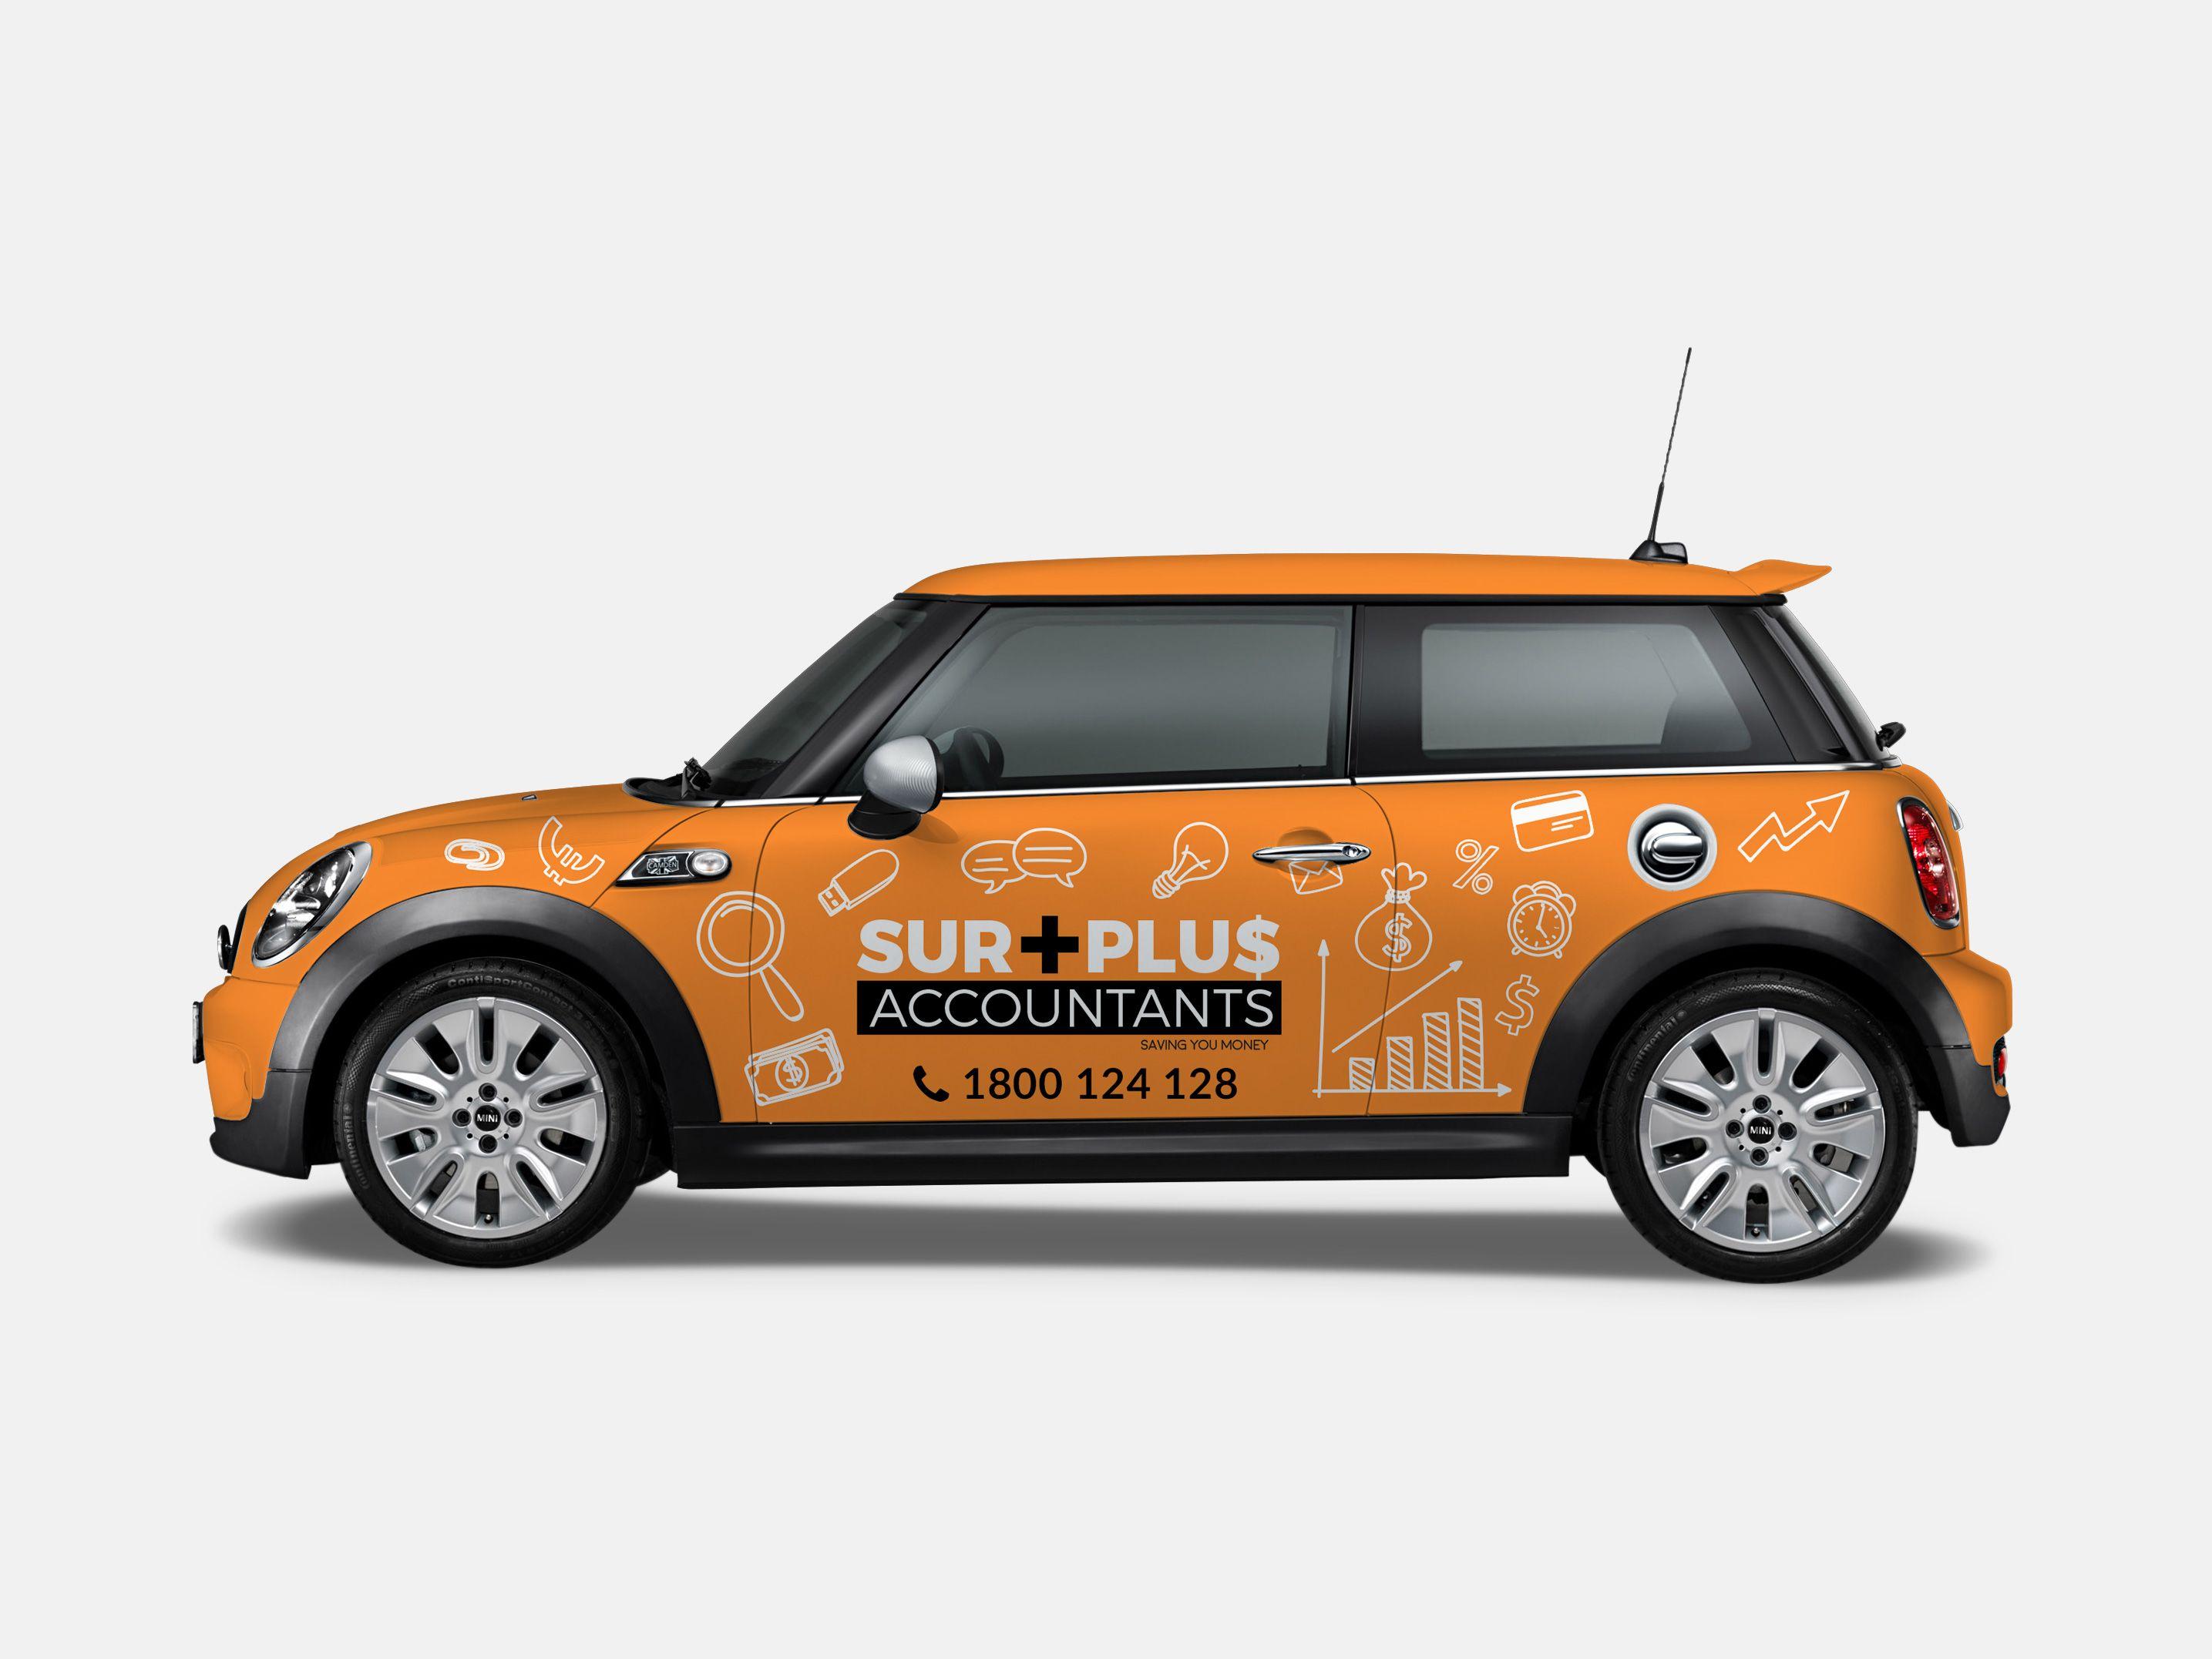 Surplus Accountants Mini Cooper Corporate Vehicle Wrap